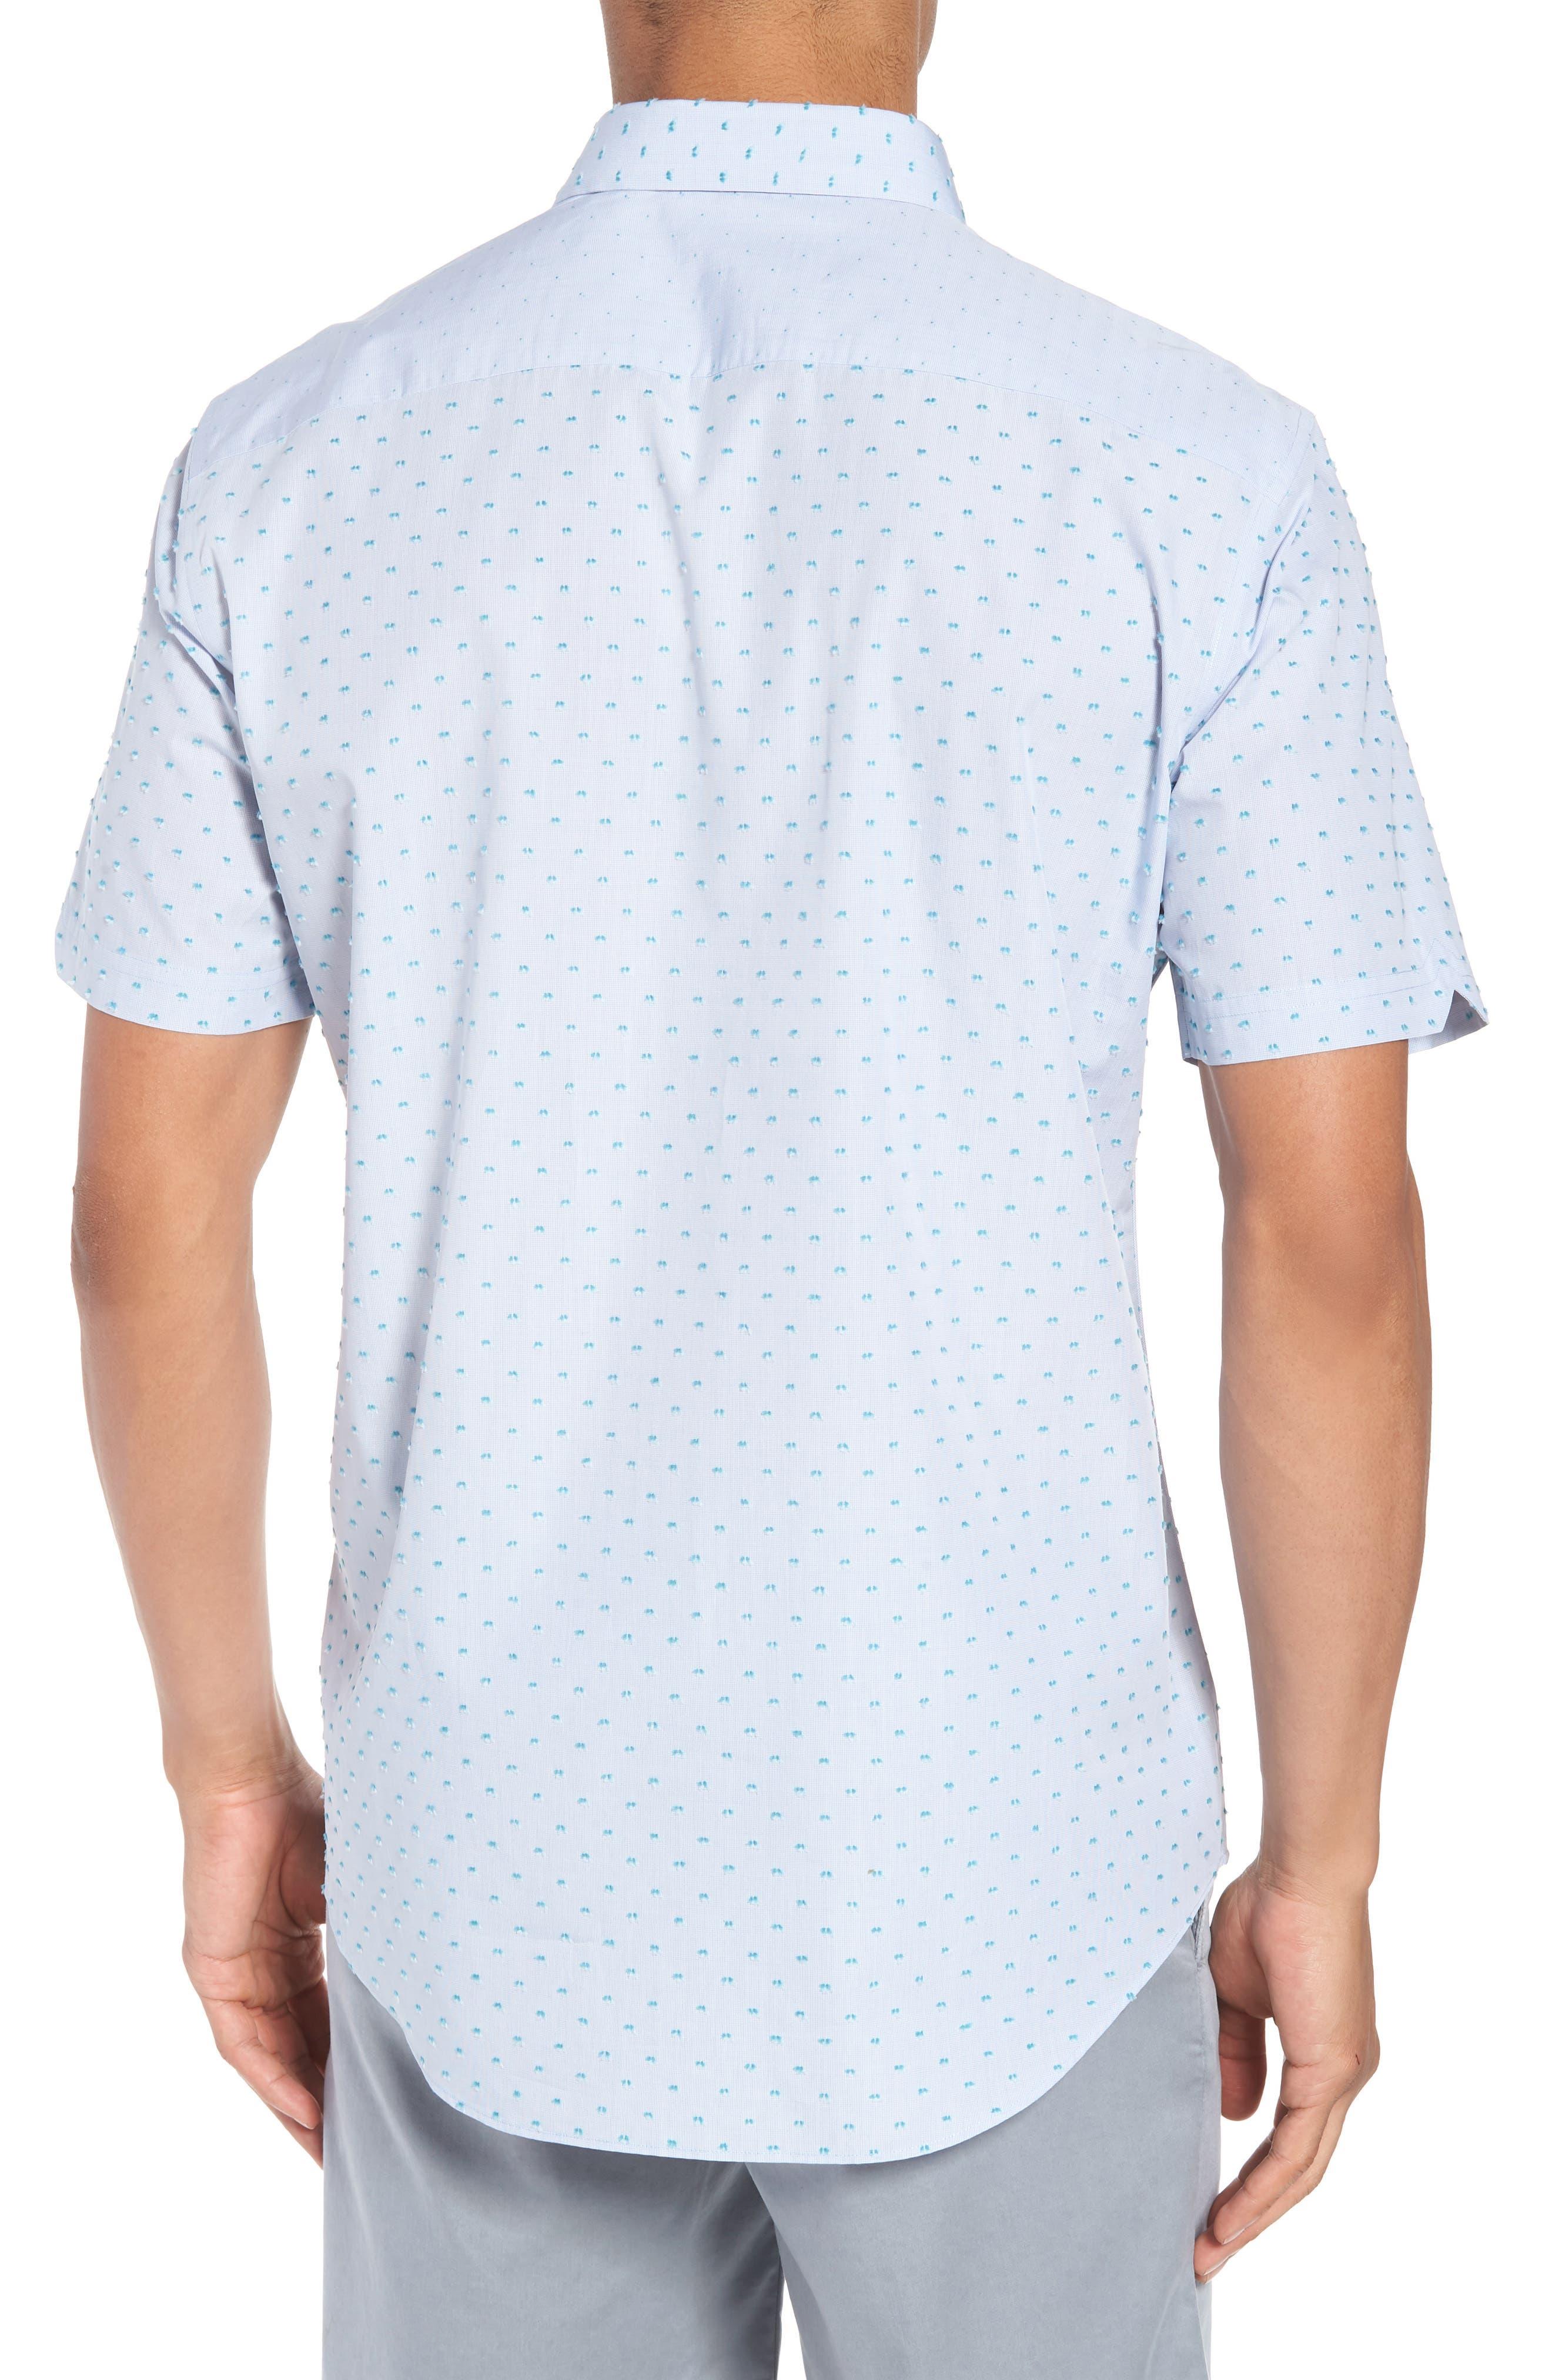 Dolle Fil a Coupe Sport Shirt,                             Alternate thumbnail 2, color,                             450